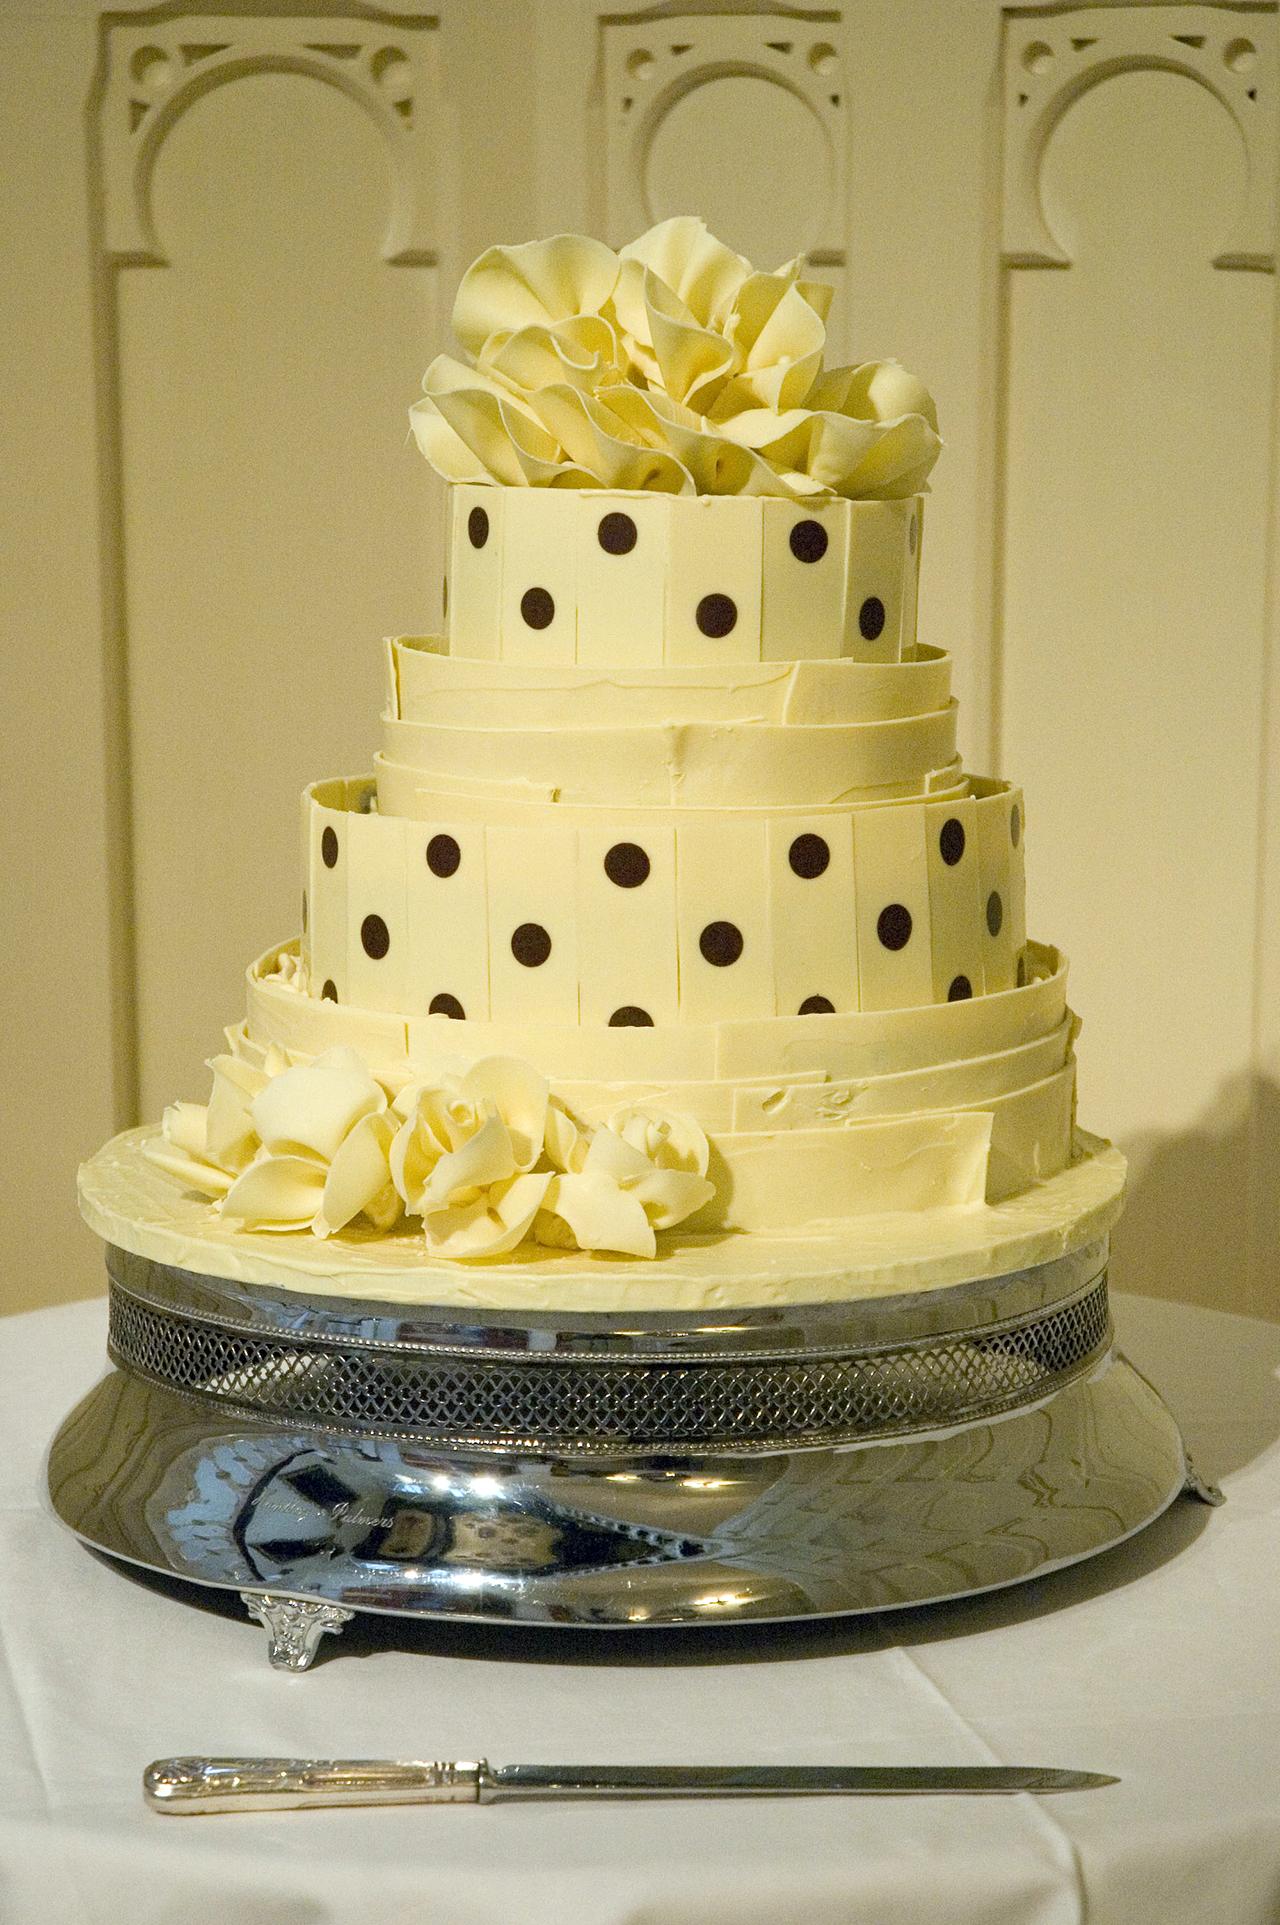 spotty white chololate wedding cake 01.jpg